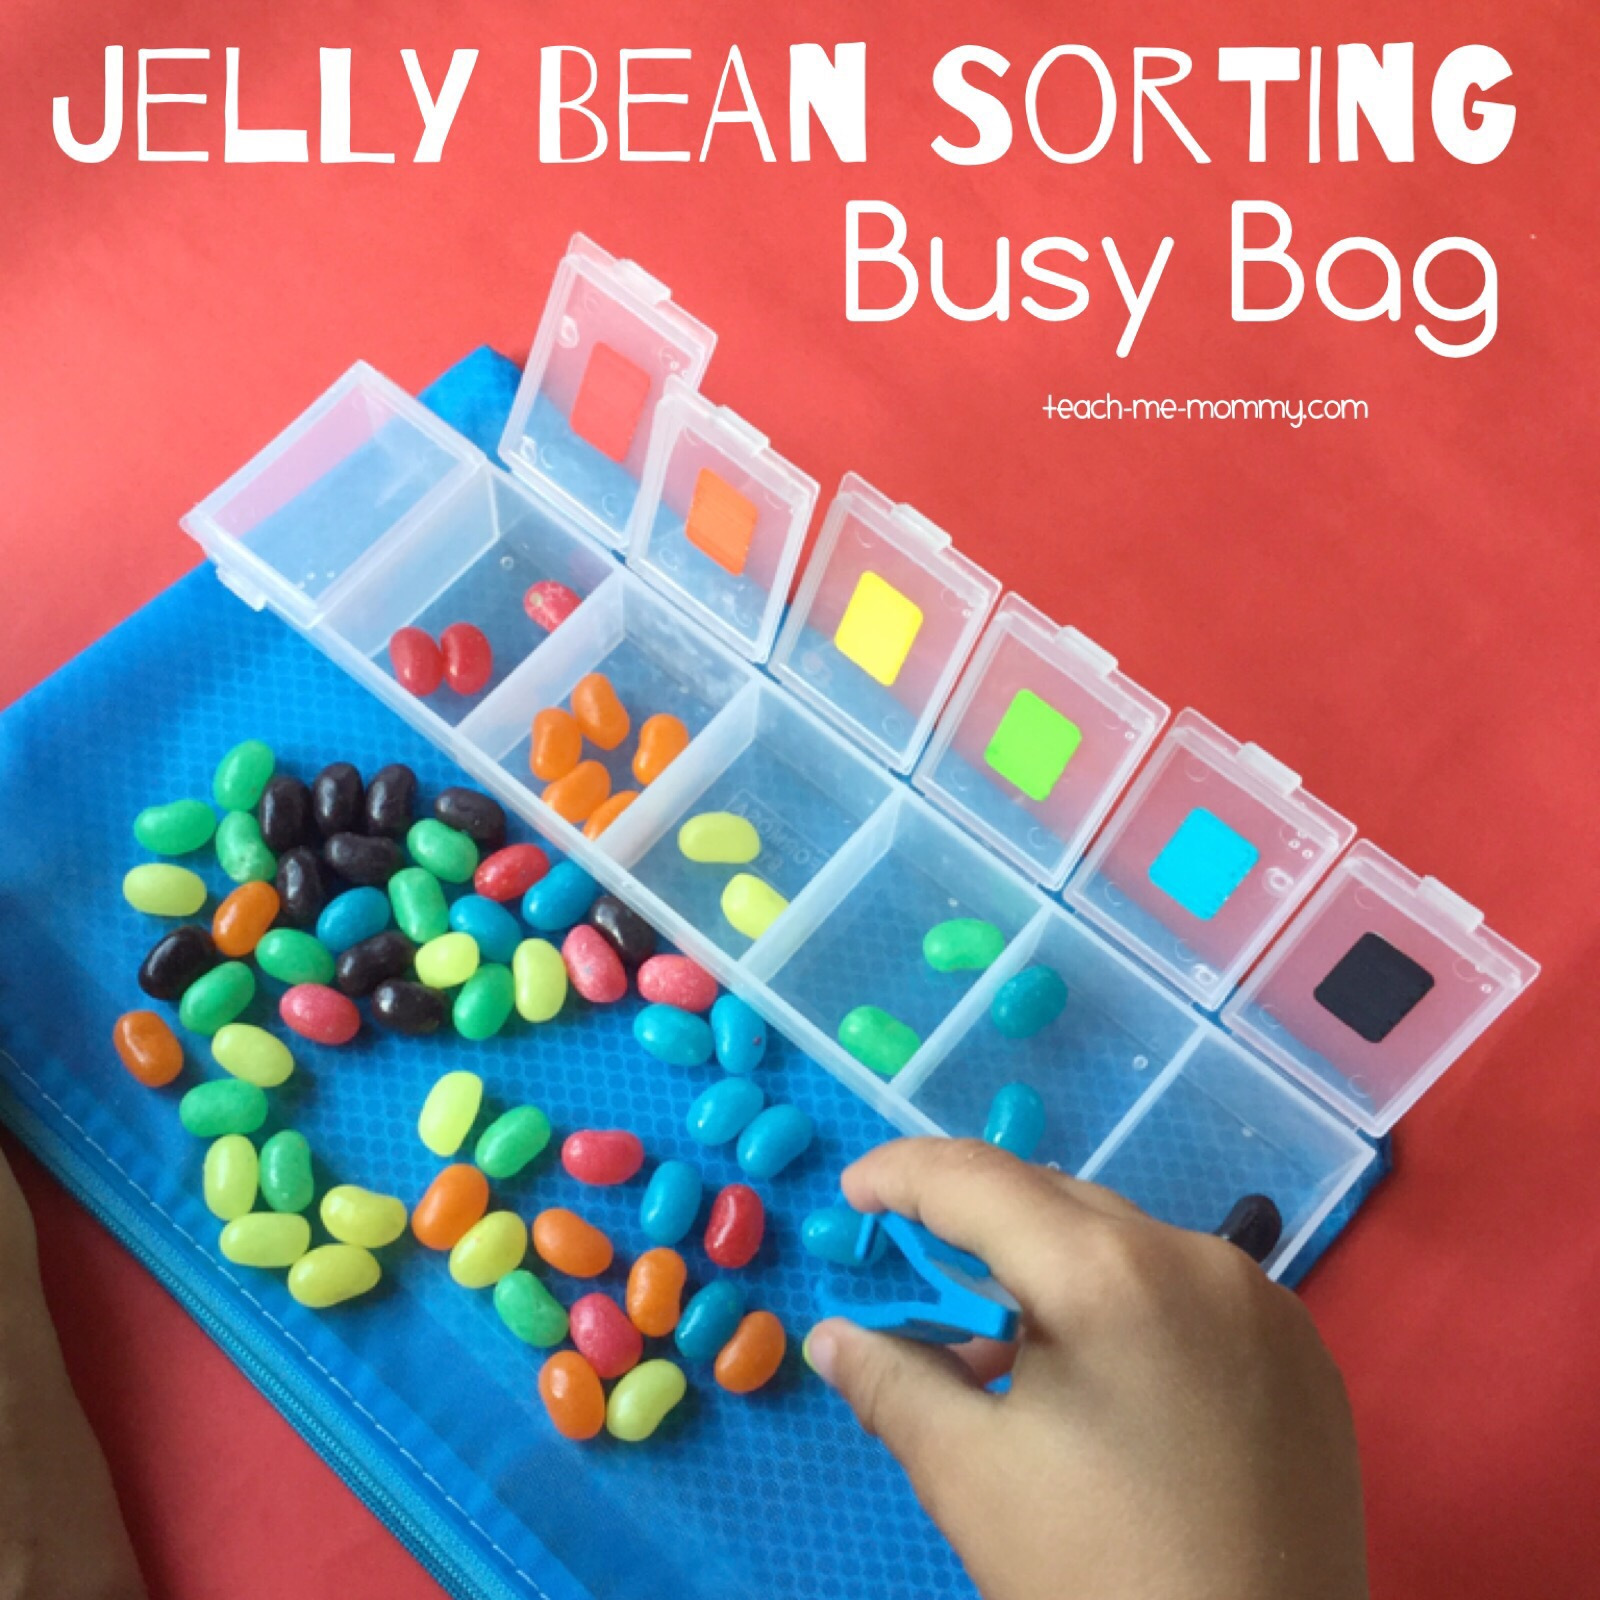 Jelly bean sorting